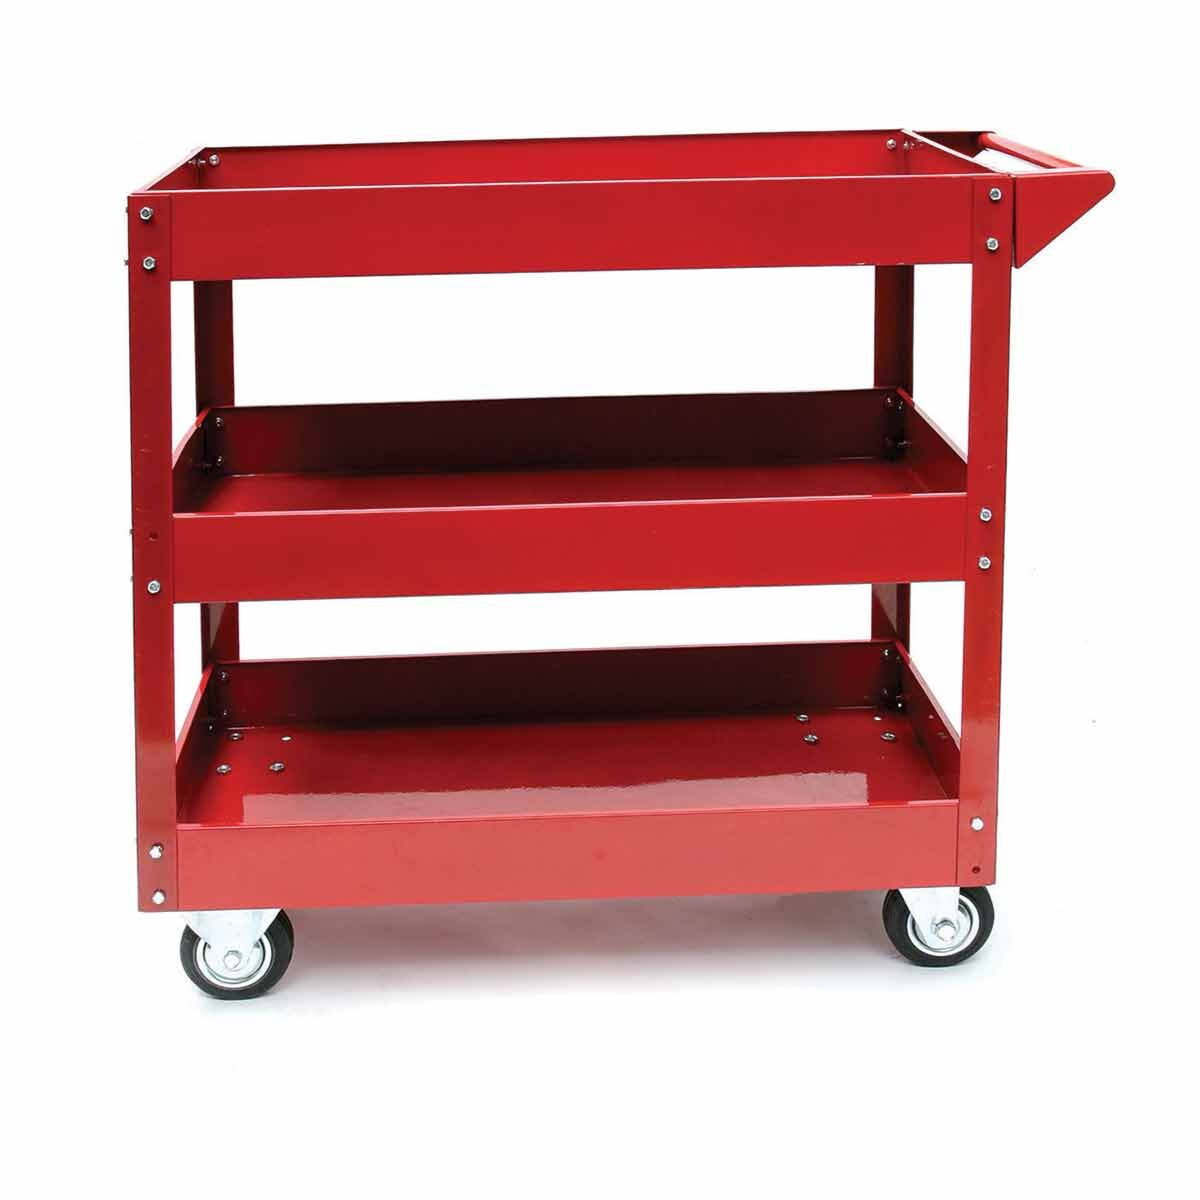 Hilka 3 Tier Service Cart